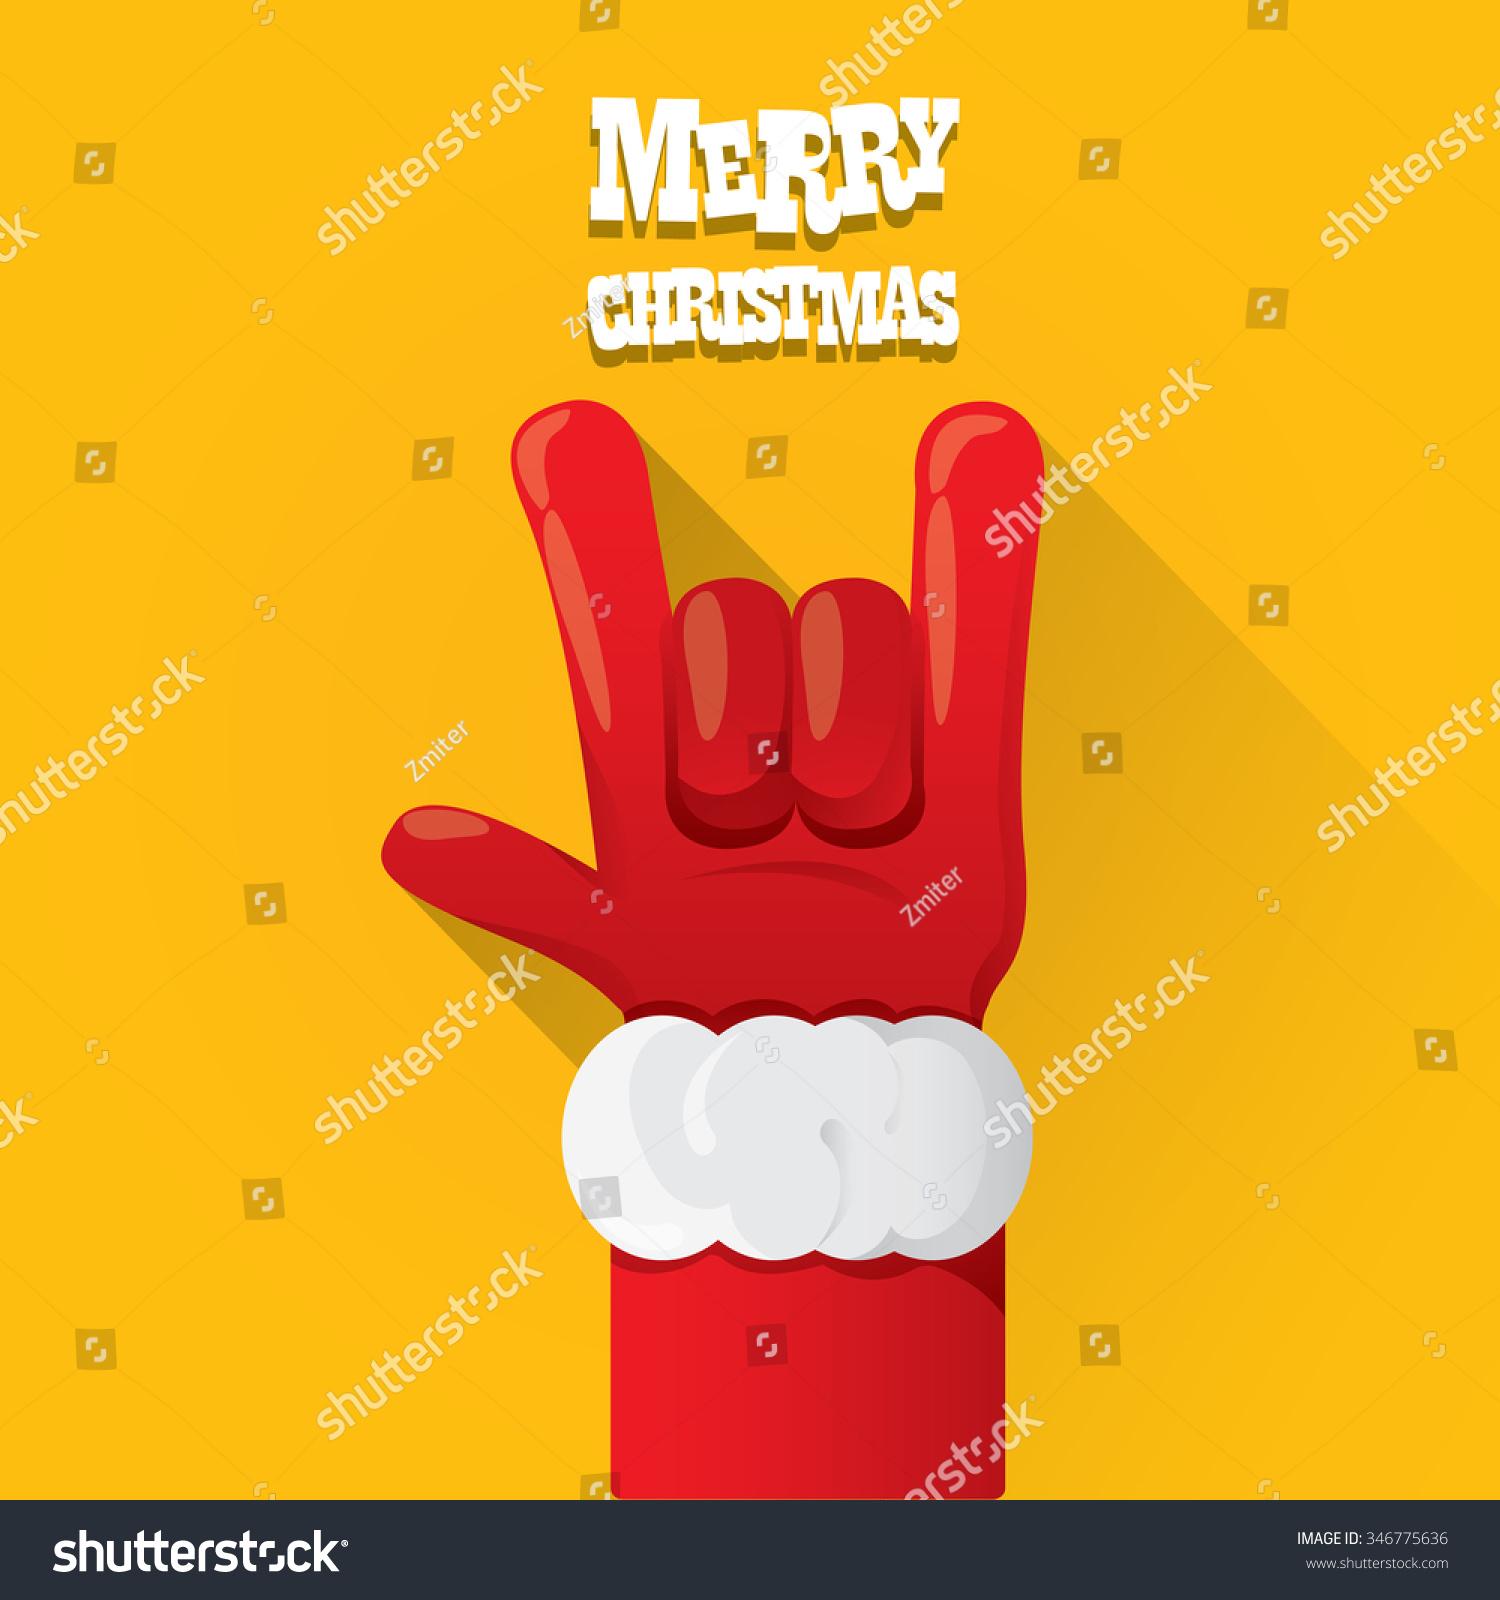 Rock n roll poster design - Santa Hand Rock N Roll Icon Vector Illustration Christmas Rock Concert Poster Design Template Or